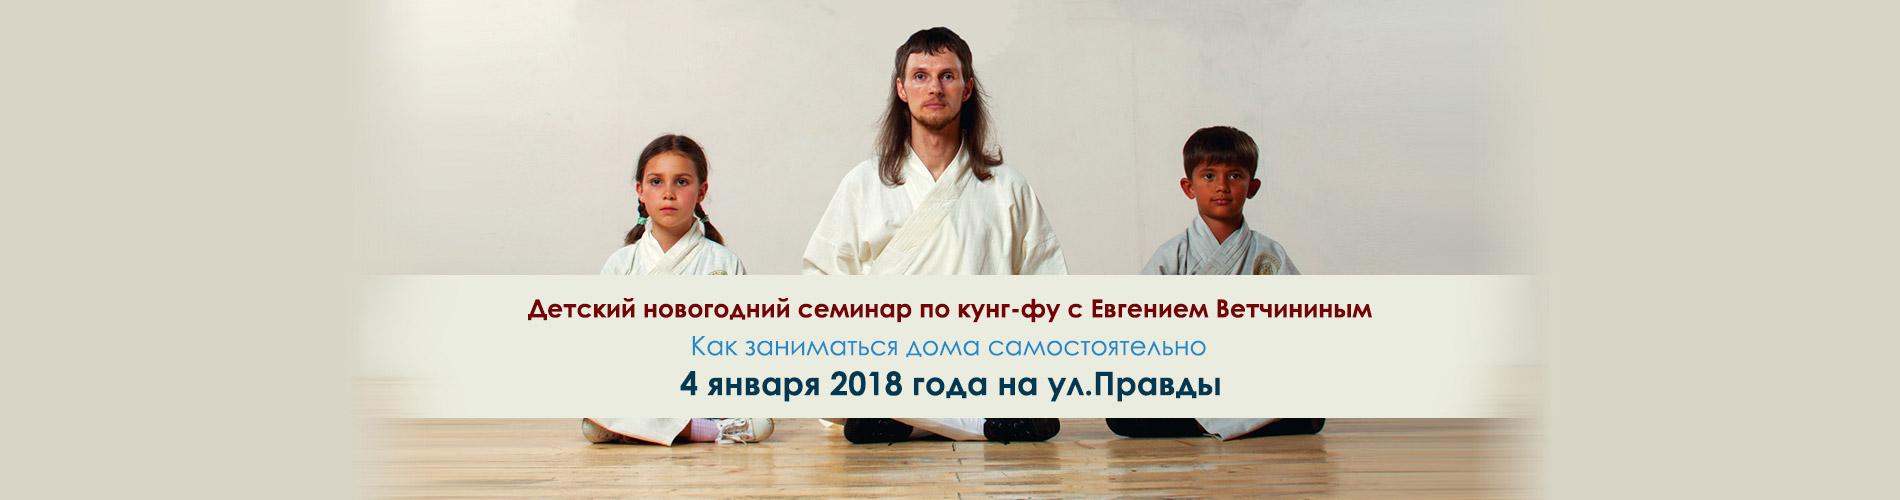 семинар-ветчинин_slider